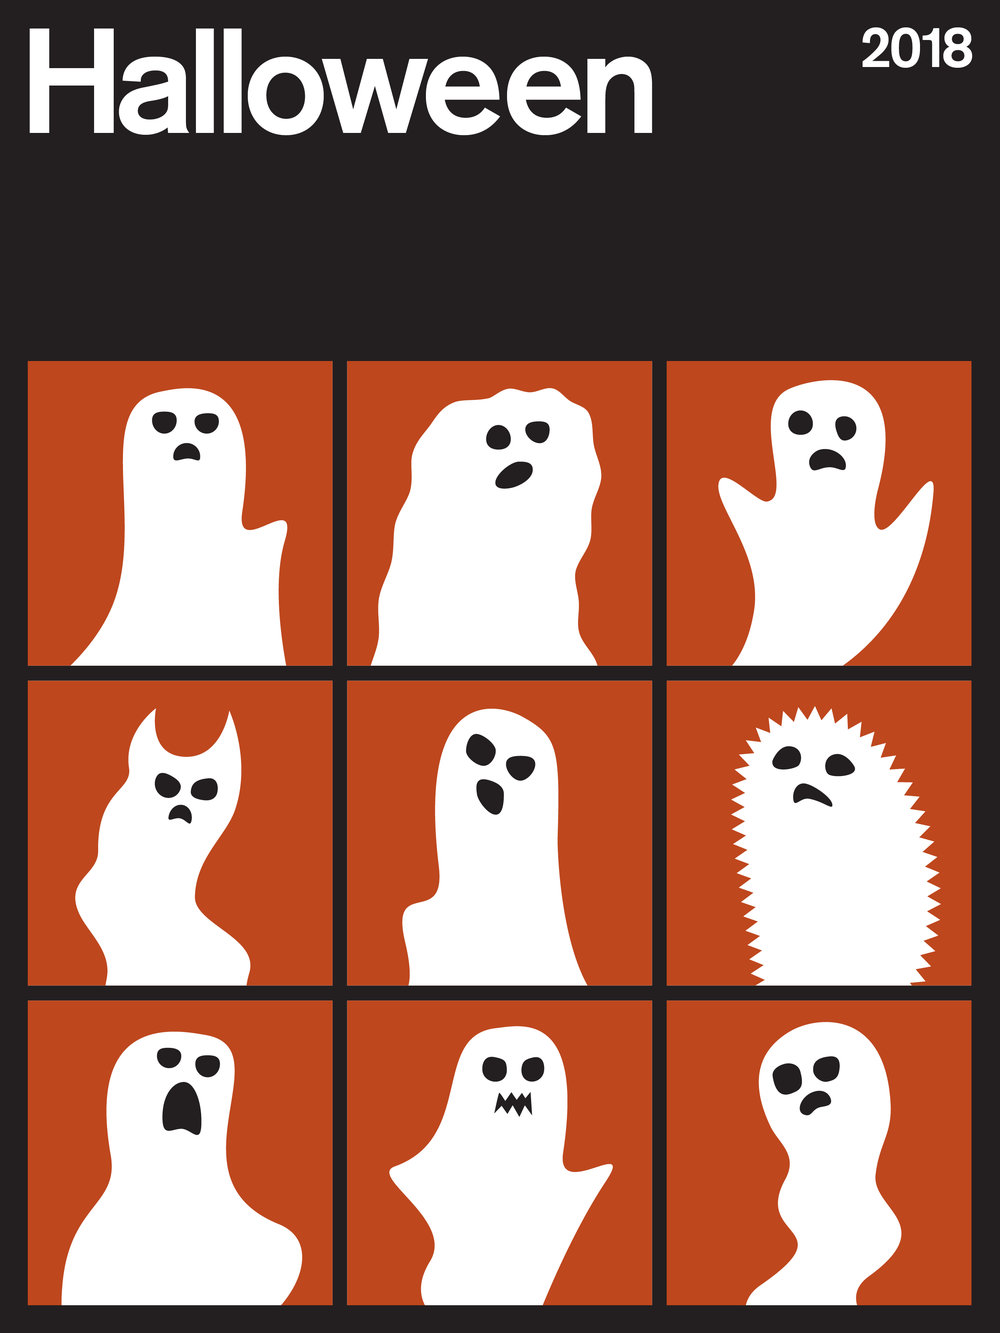 Halloween ghosts IG 3.jpg